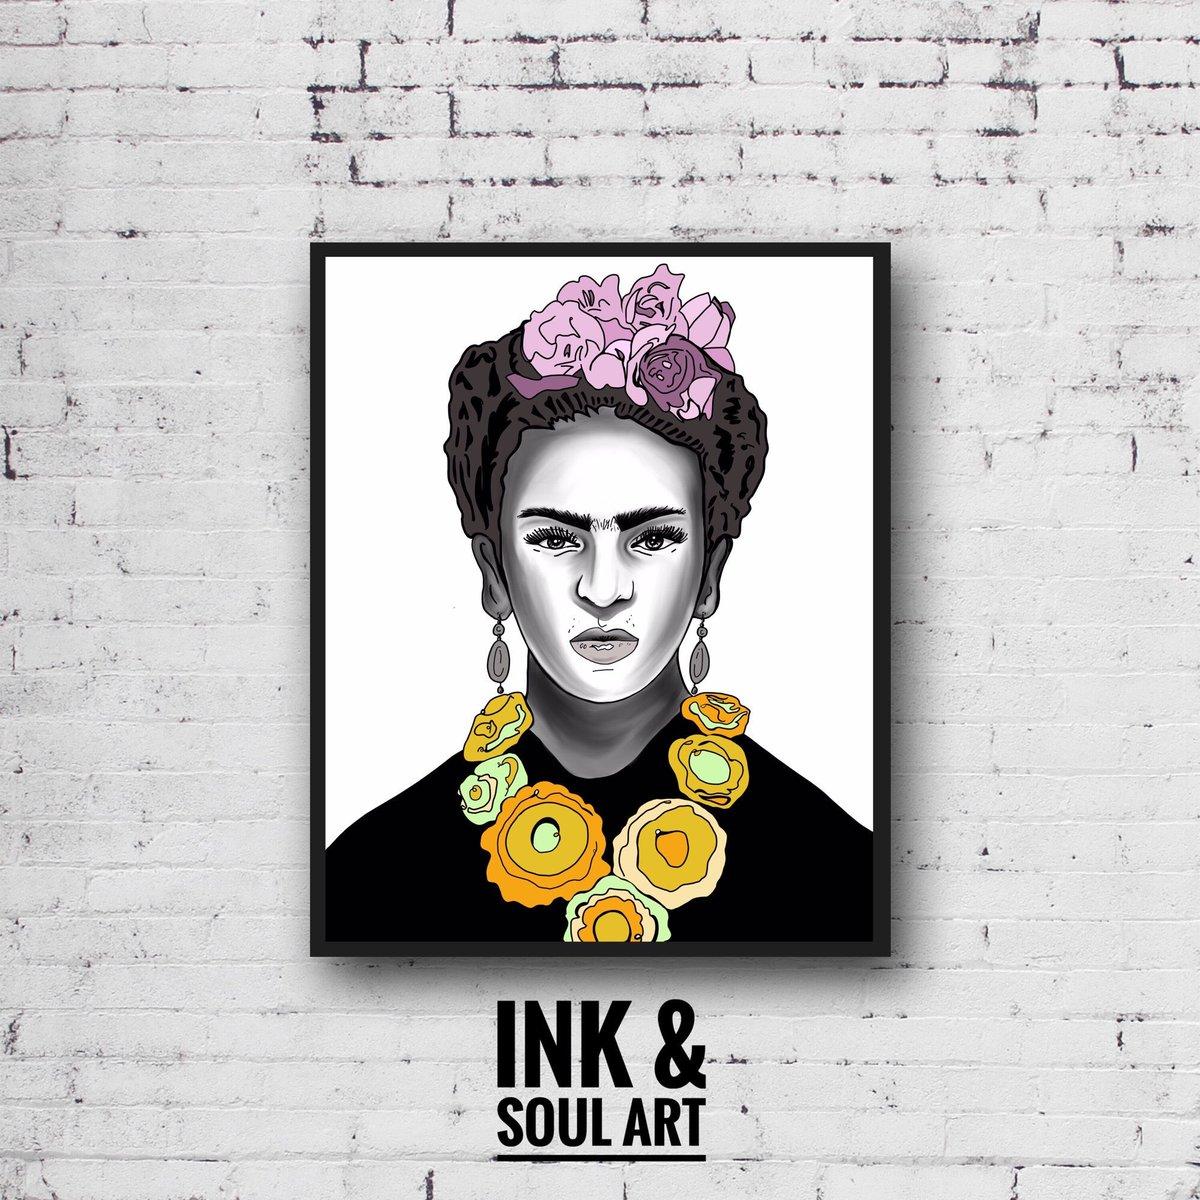 """Frida"" 🎨🌹 . . . #fridakahlo #frida #mexico #feminist #fridaart #portrait #digitalart #art #fridalove #handmade #famousartist #painter #etsyart #etsyartist #etsyshop #etsyfinds  #etsygifts #2020 #jpg #artist #art #inkandsoulart"